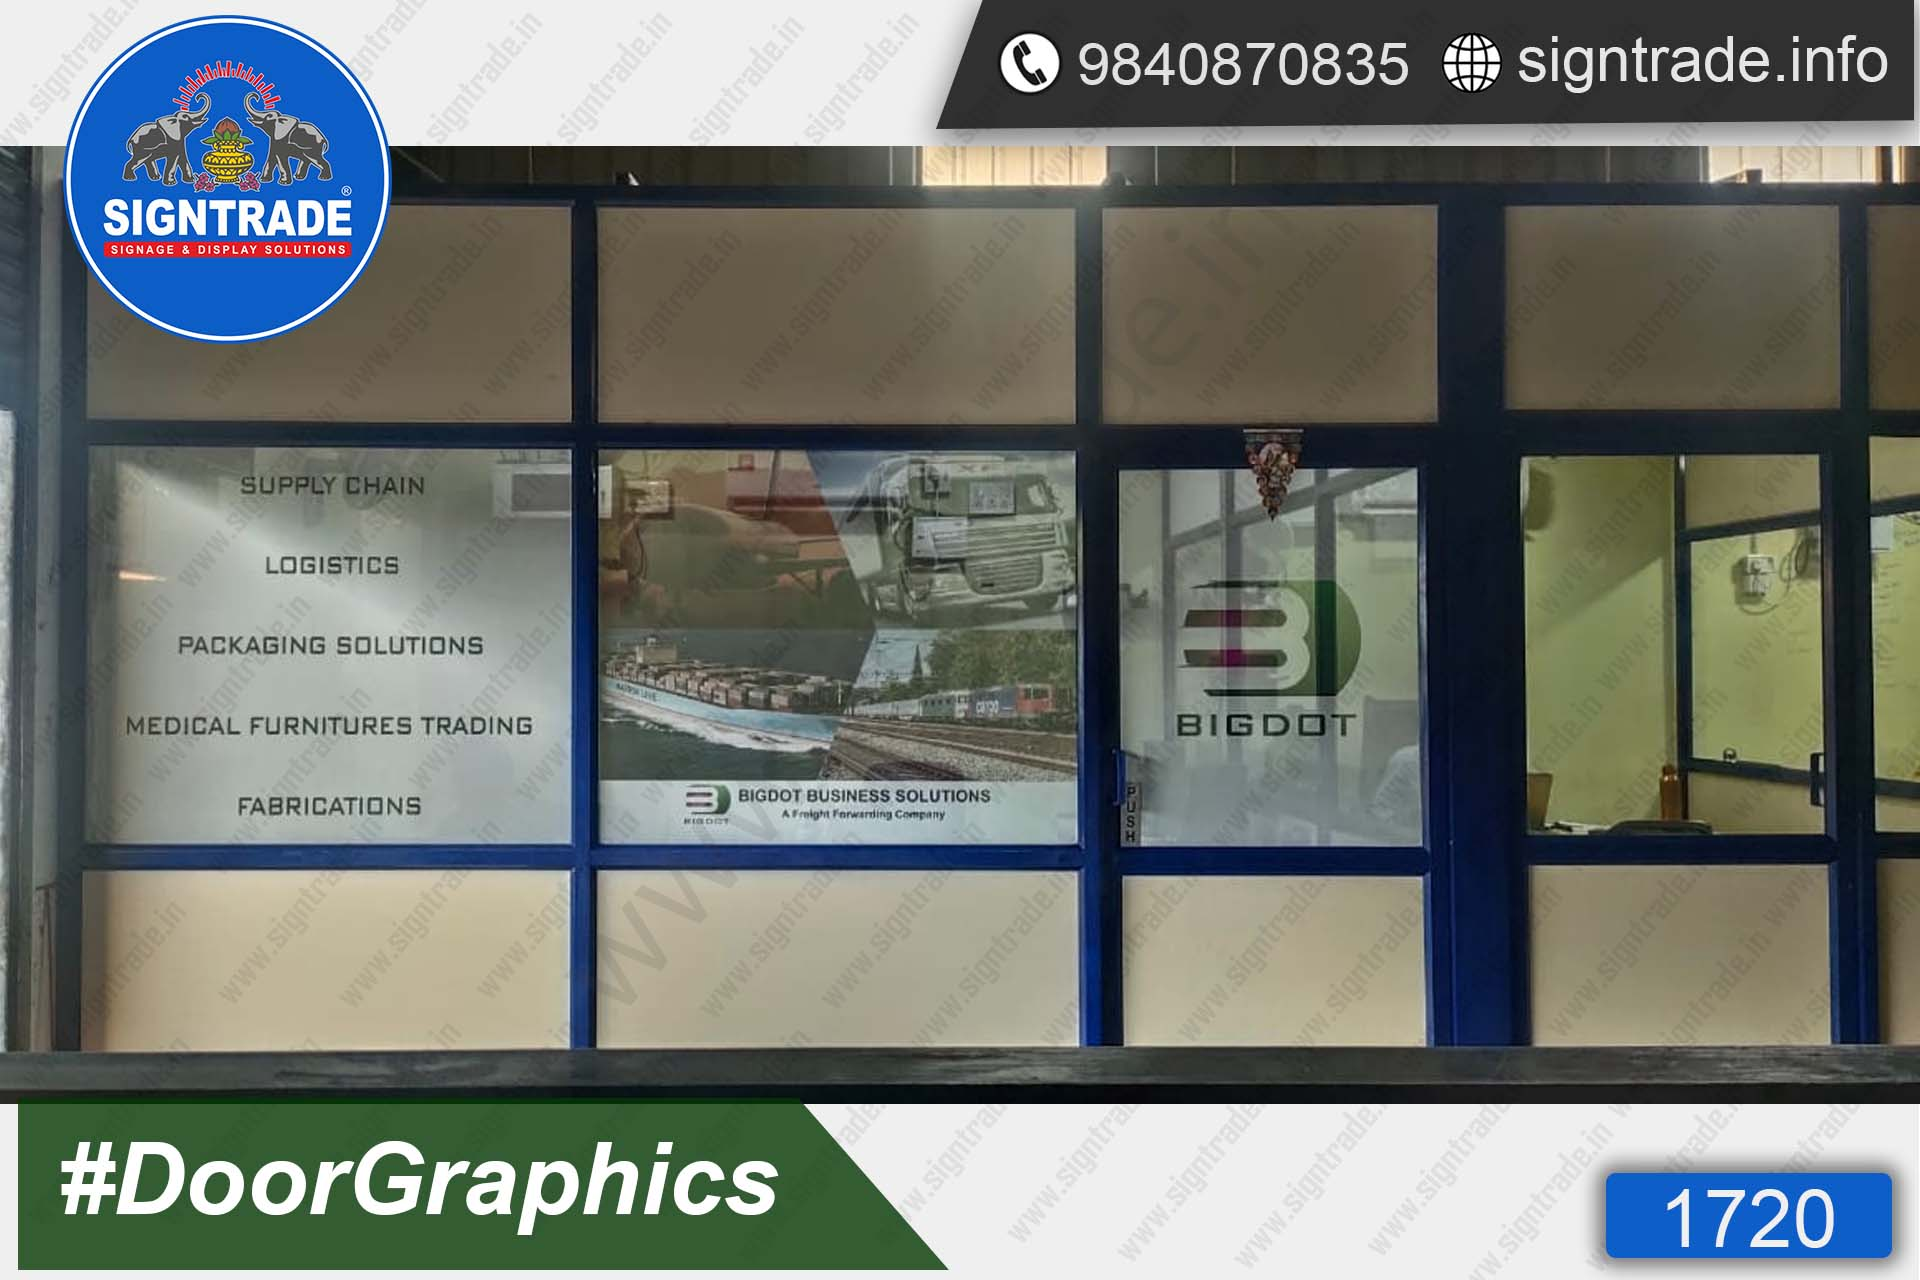 BIGDOT Business solutions, Chennai - SIGNTRADE - Door Graphics, Vinyl Printing, Digital Printing Service in Chennai